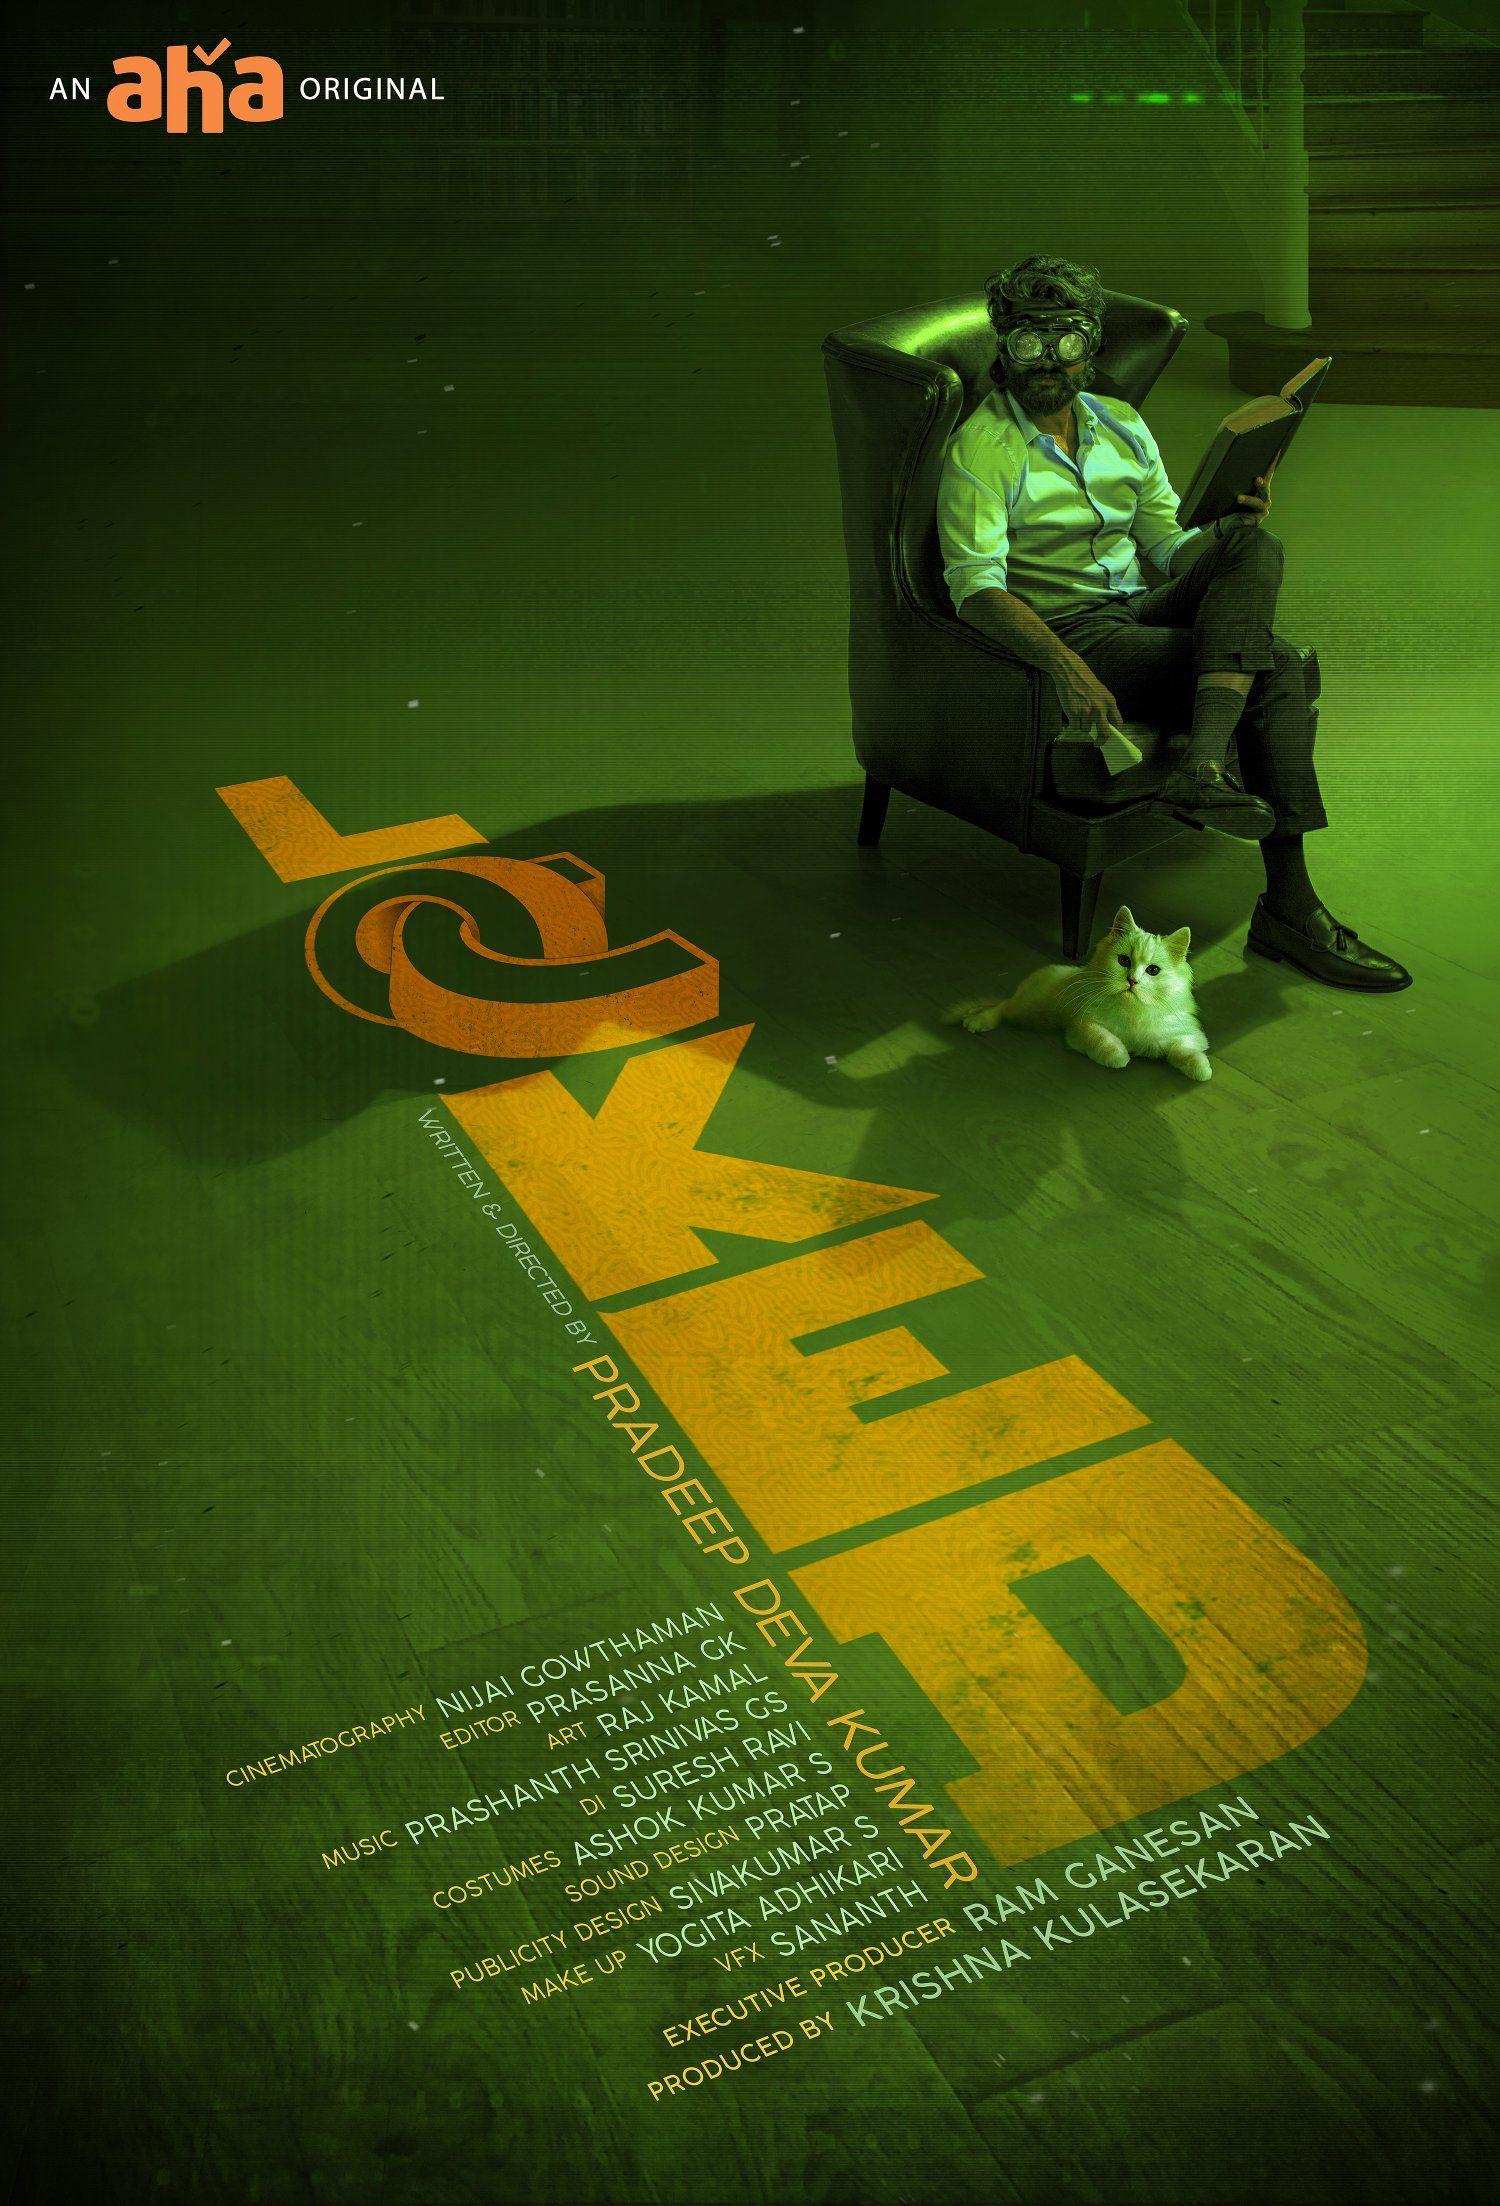 Locked Poster Design In 2020 Poster Motion Poster Poster Design